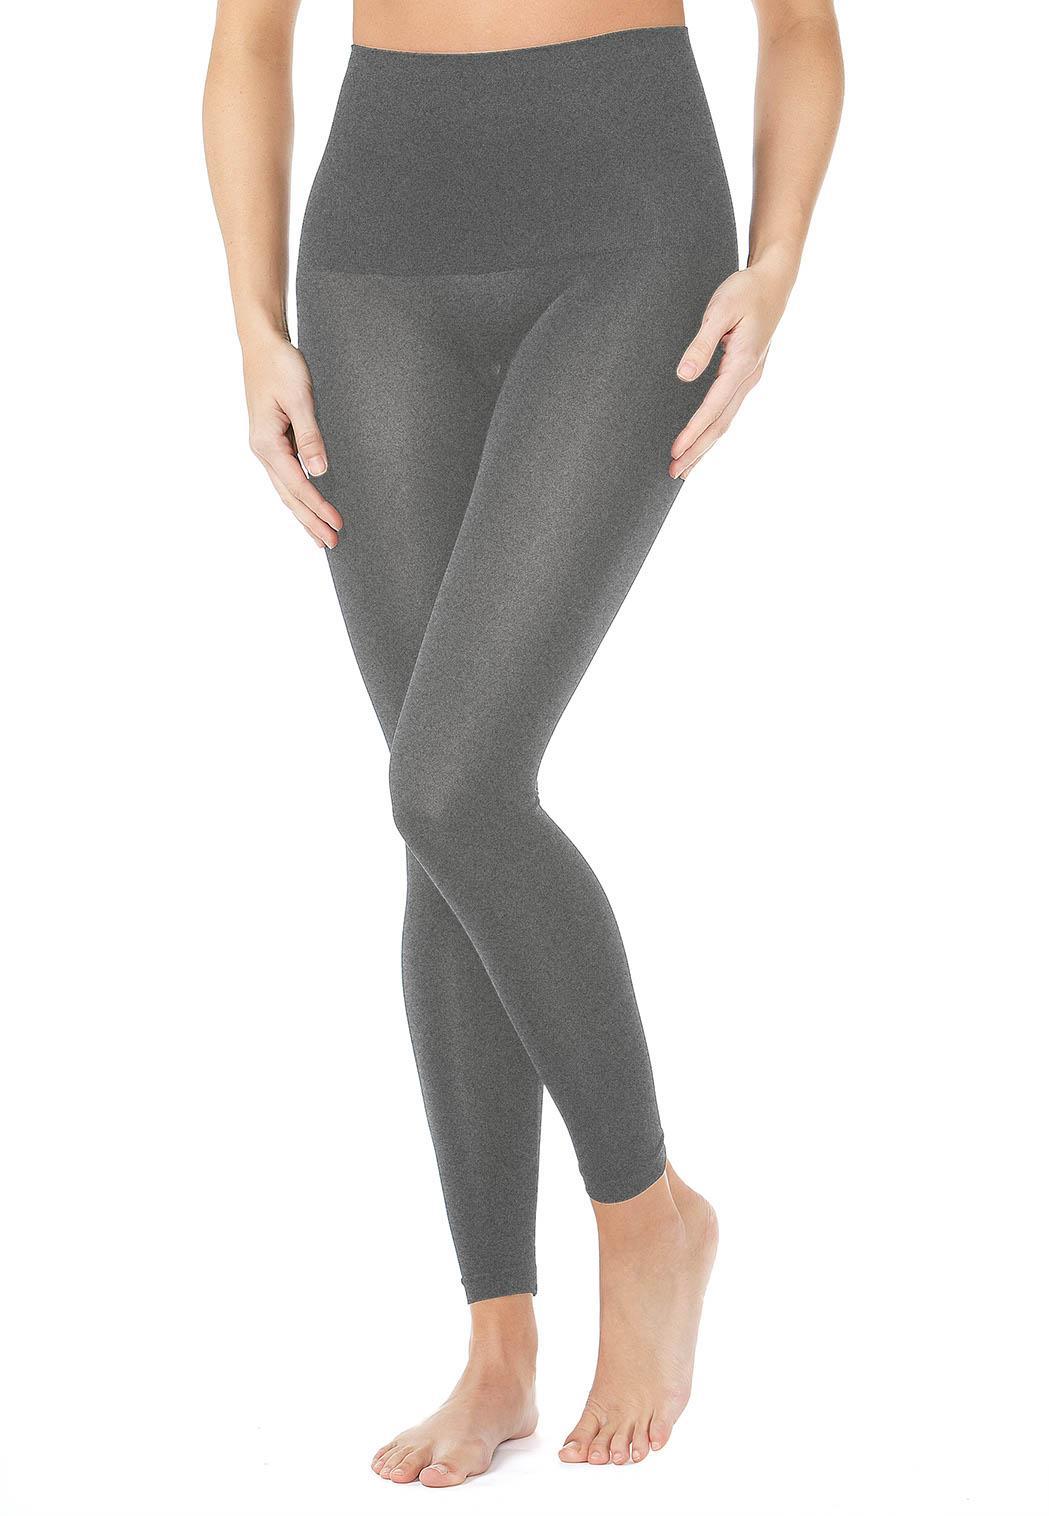 Charcoal Gray Control Leggings-Plus Shapewear Cato Fashions